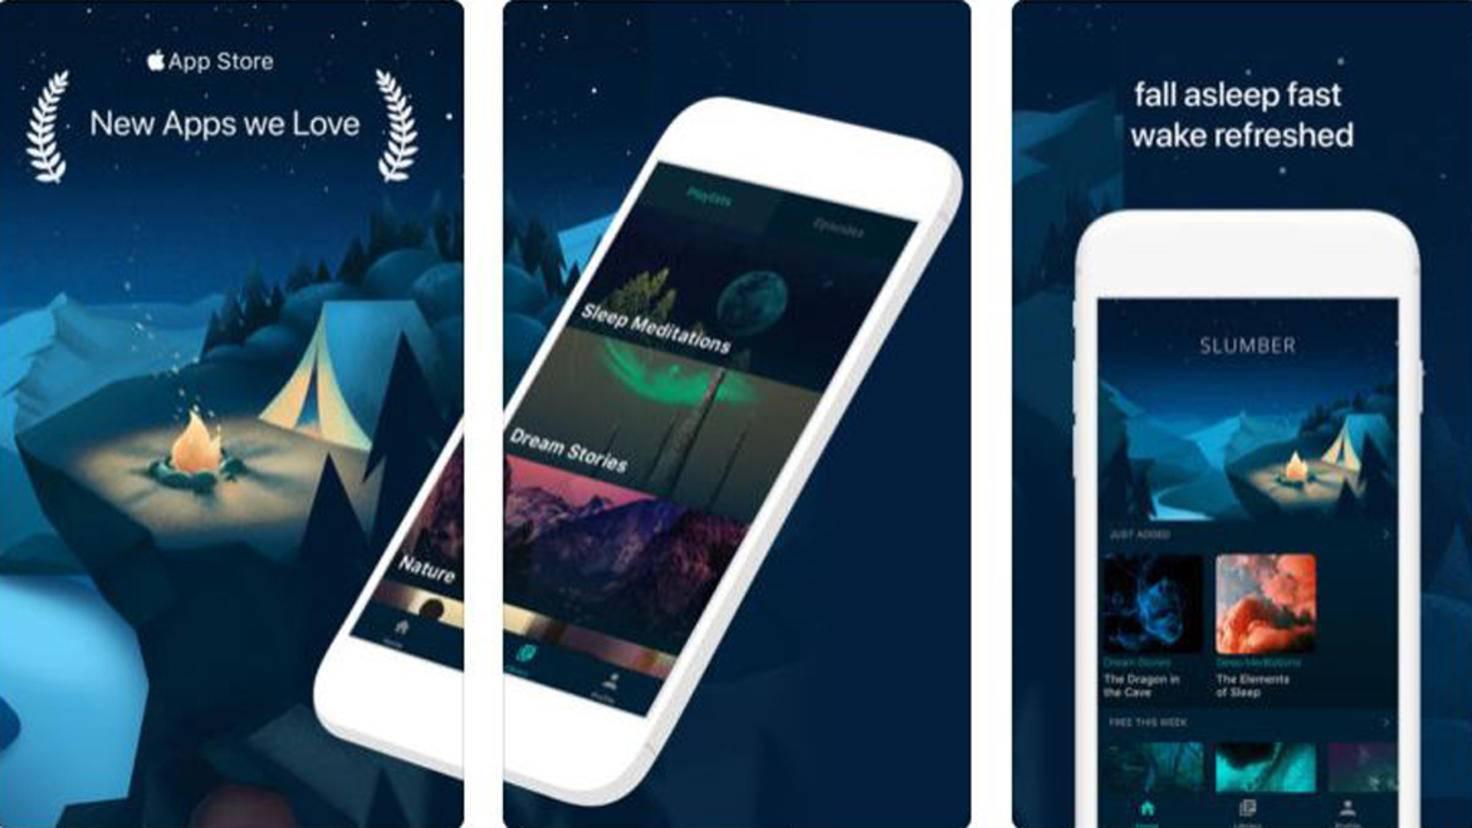 slumber app